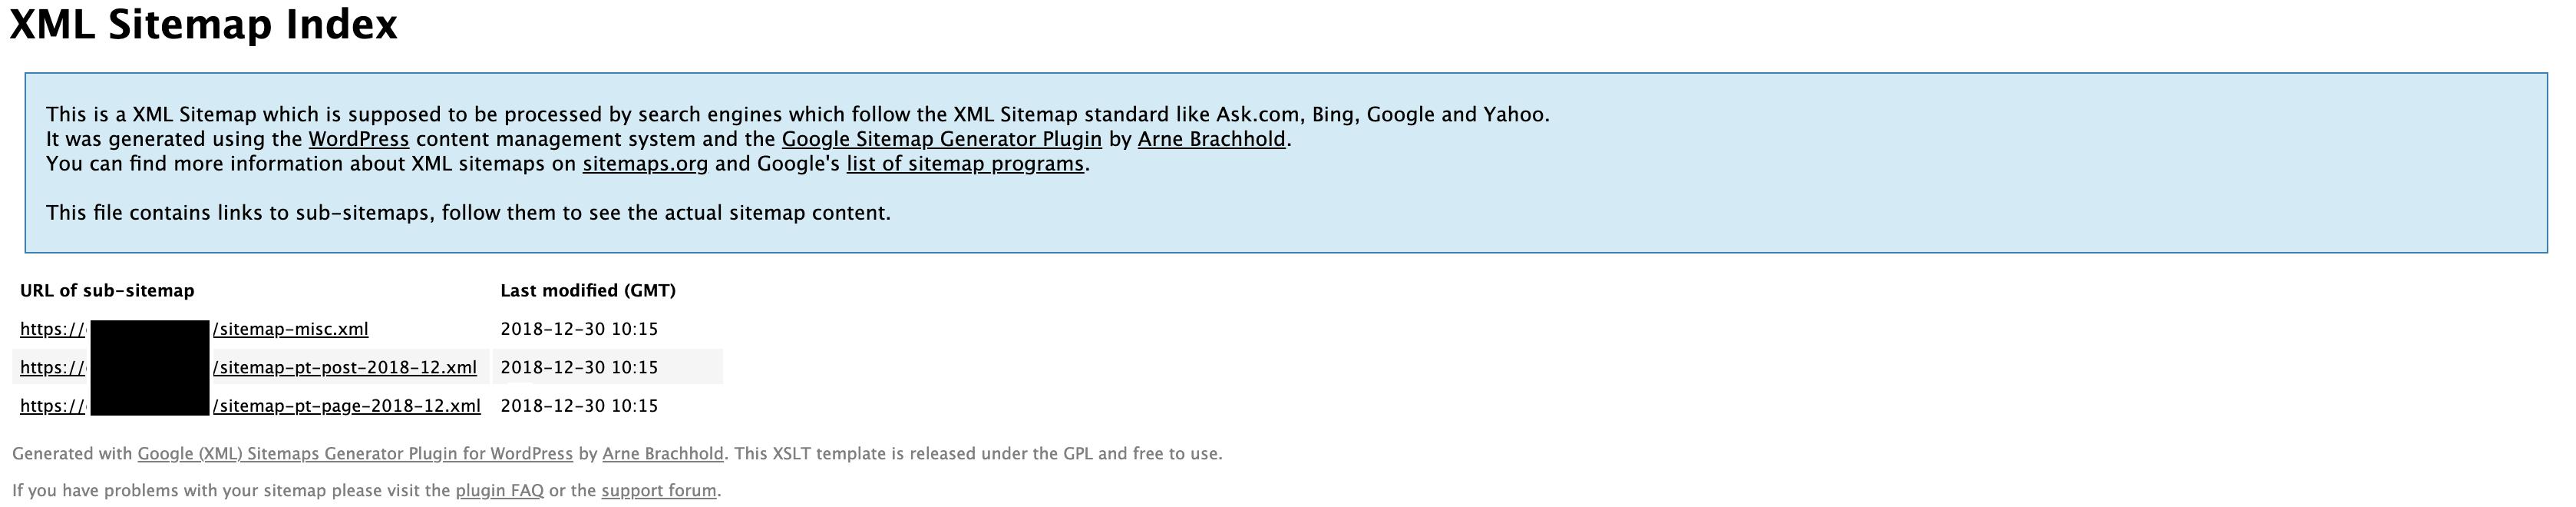 Google XML Sitemaps URL